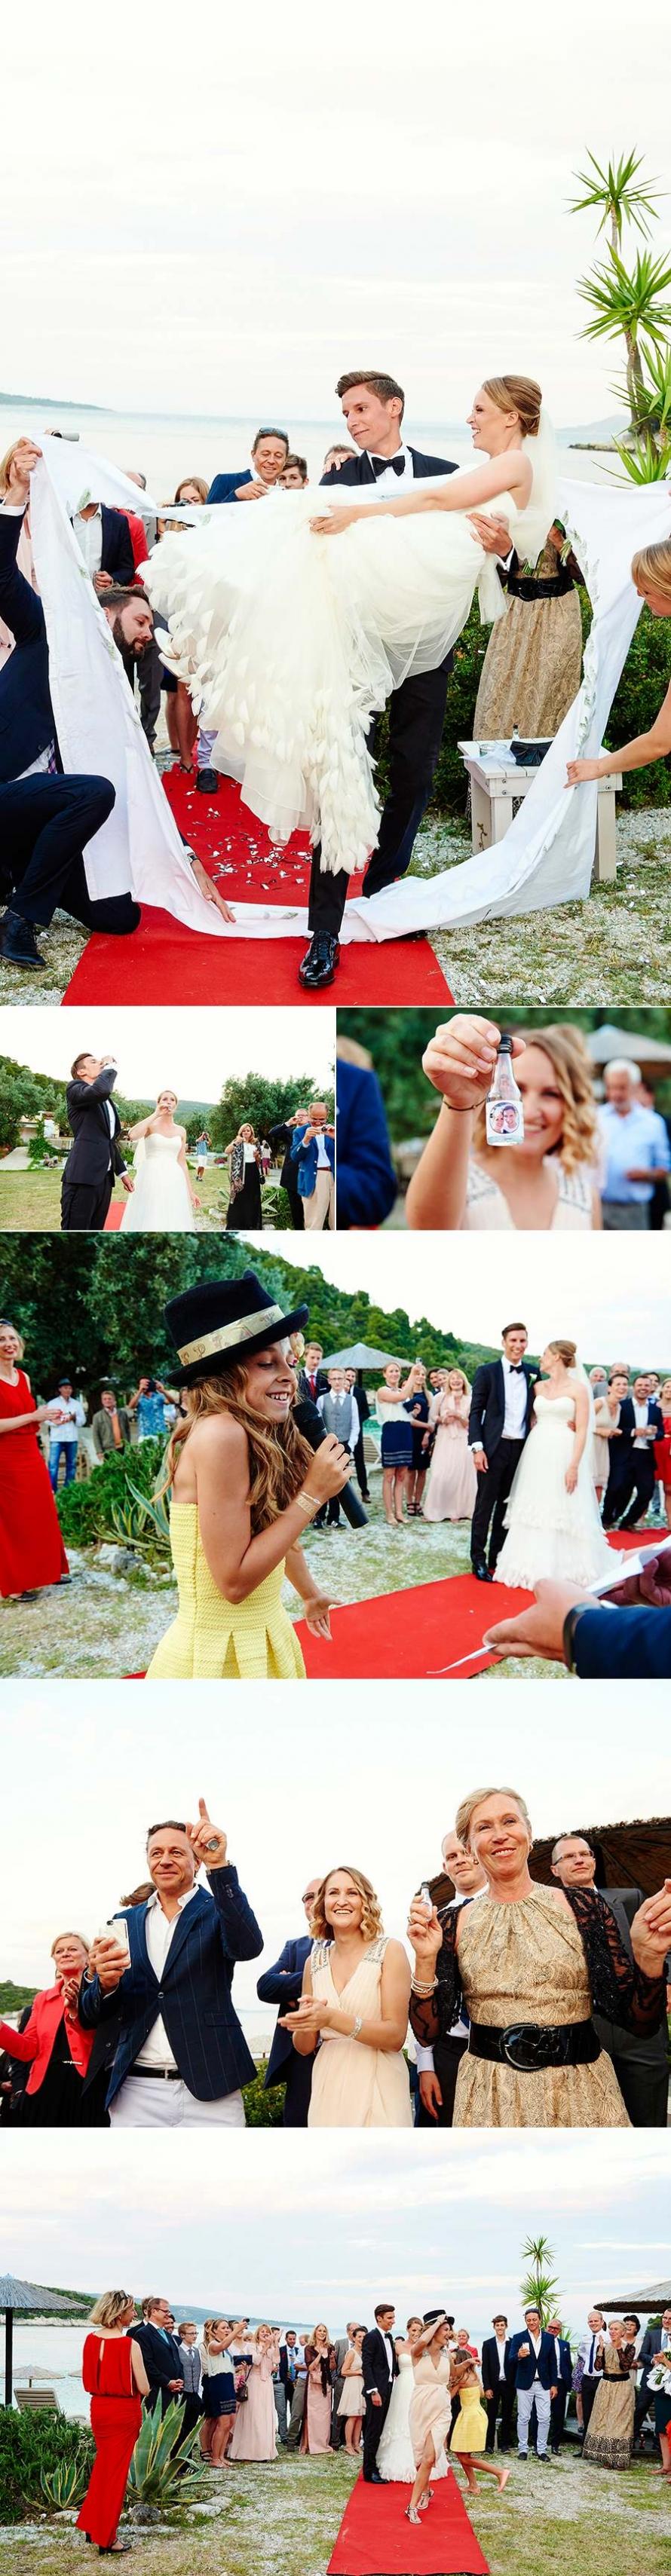 Tobi & Vanessa wedding photos 23